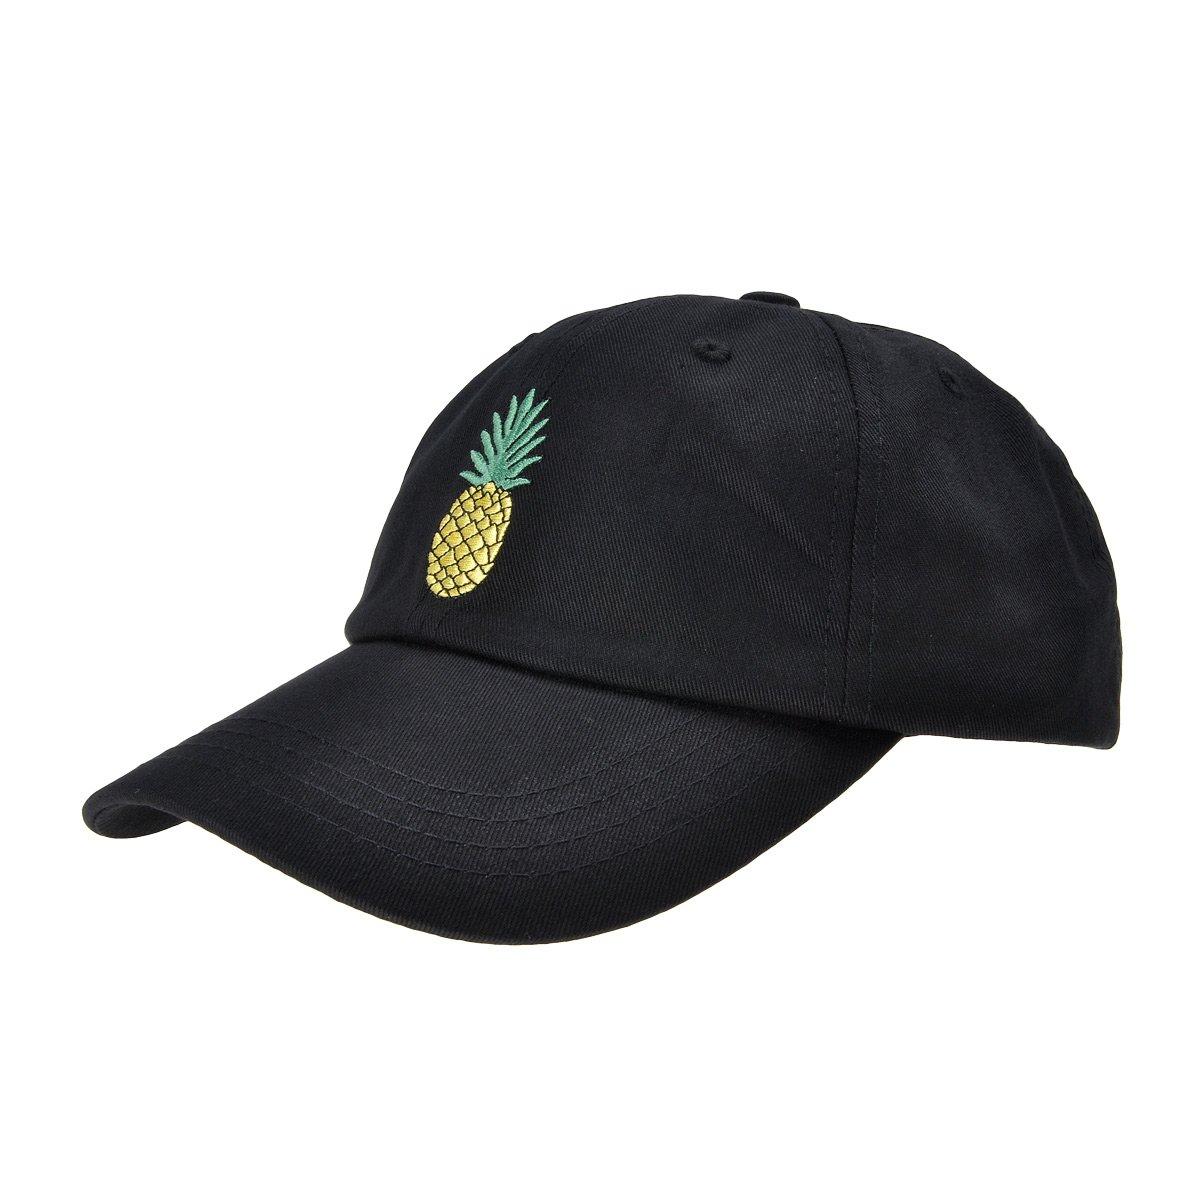 ZLYC - Gorra de béisbol - para Hombre Negro Black, Pineapple Talla ...